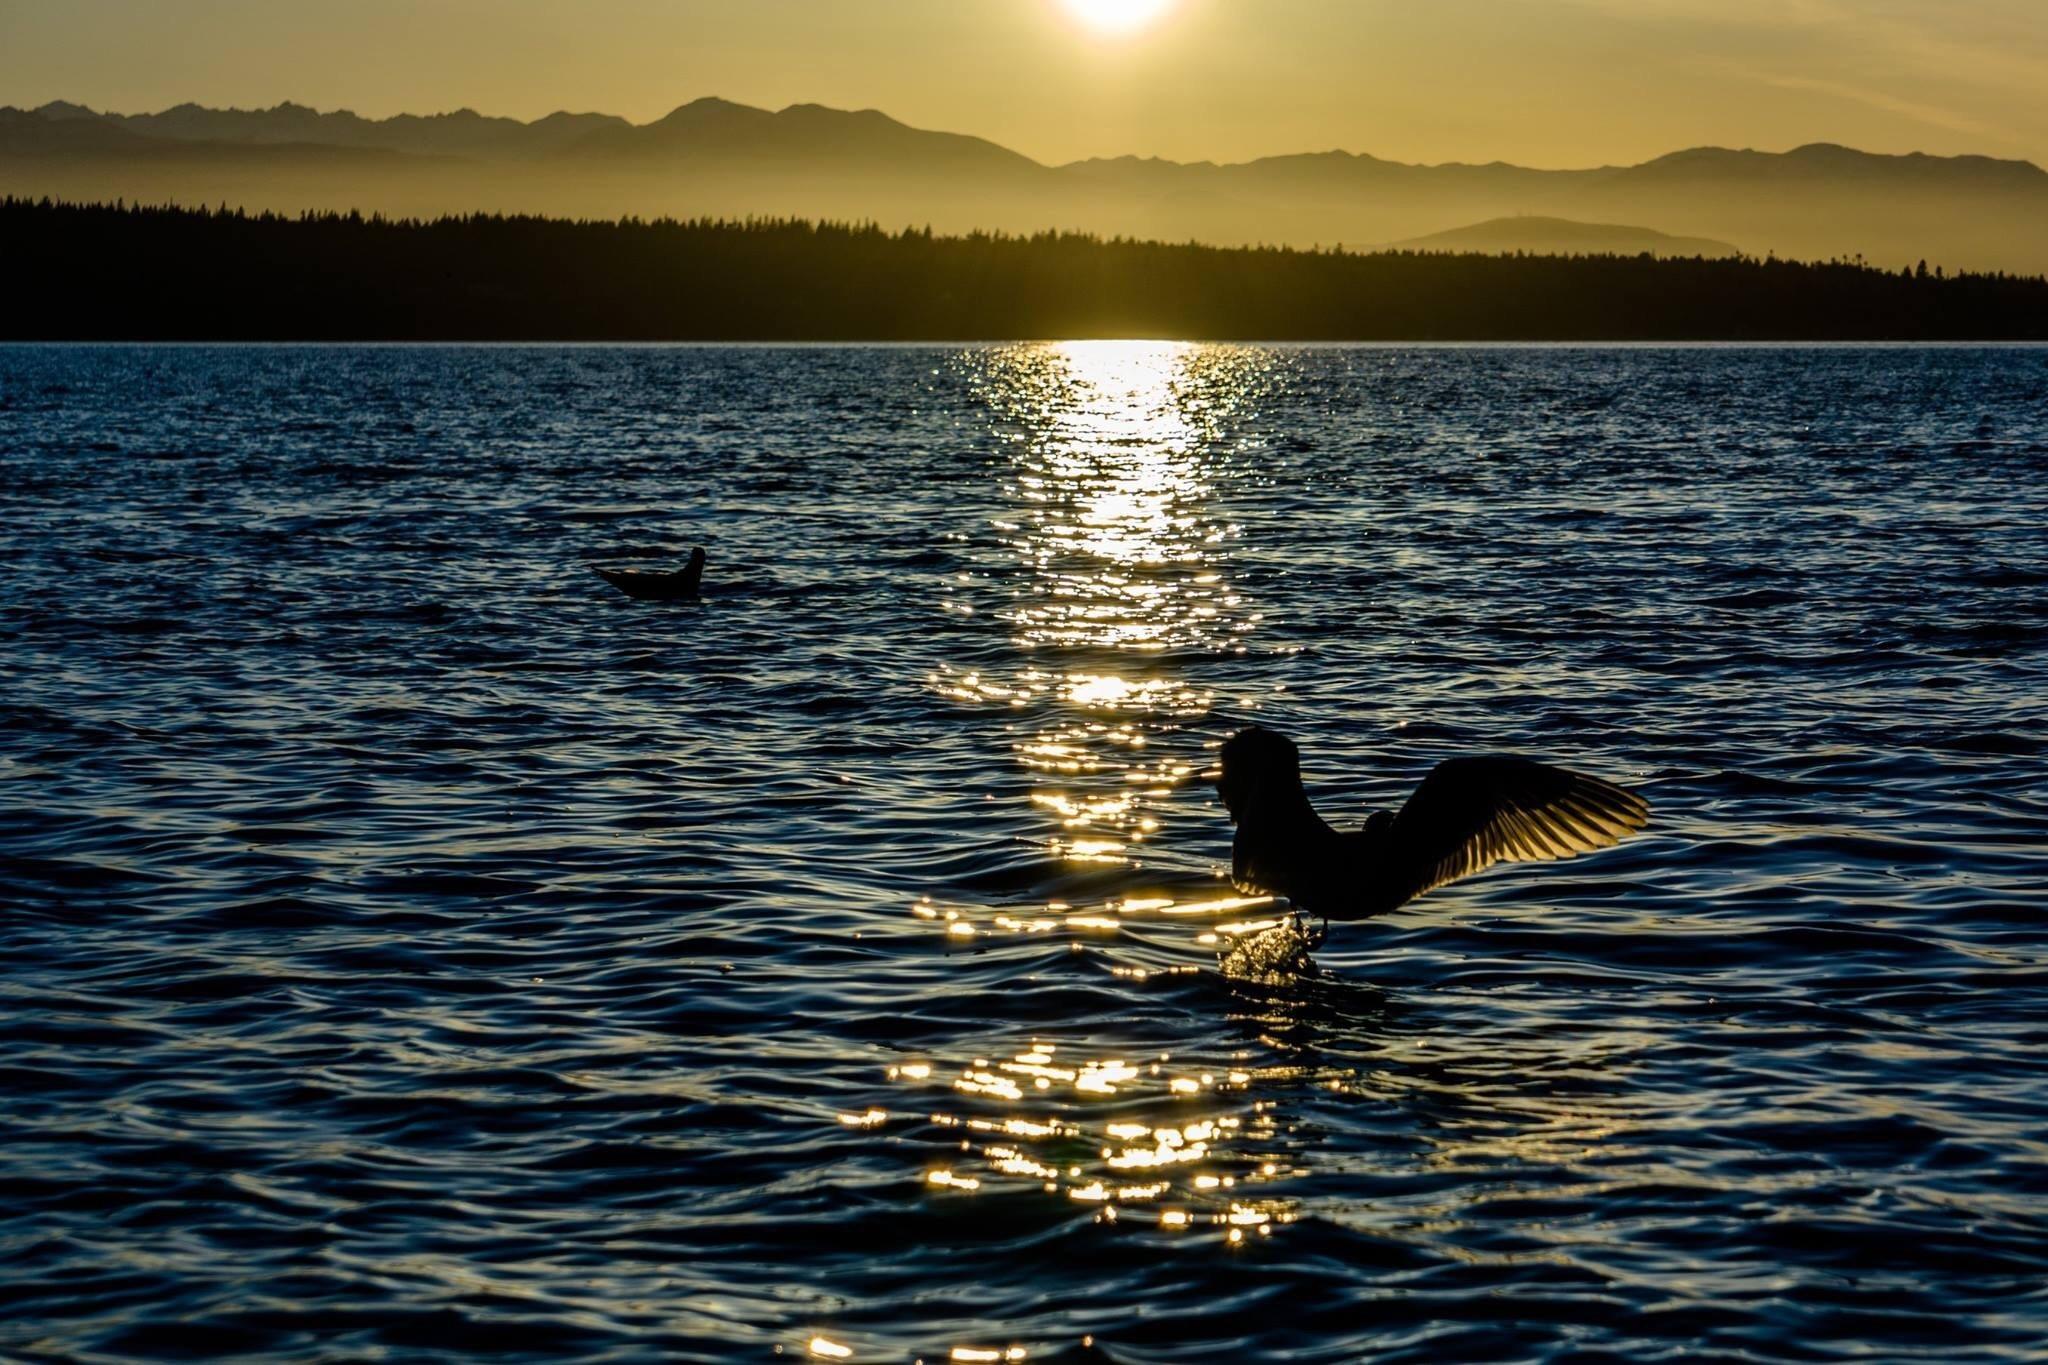 Camano Island State Park, Camano Island, Washington, United States of America